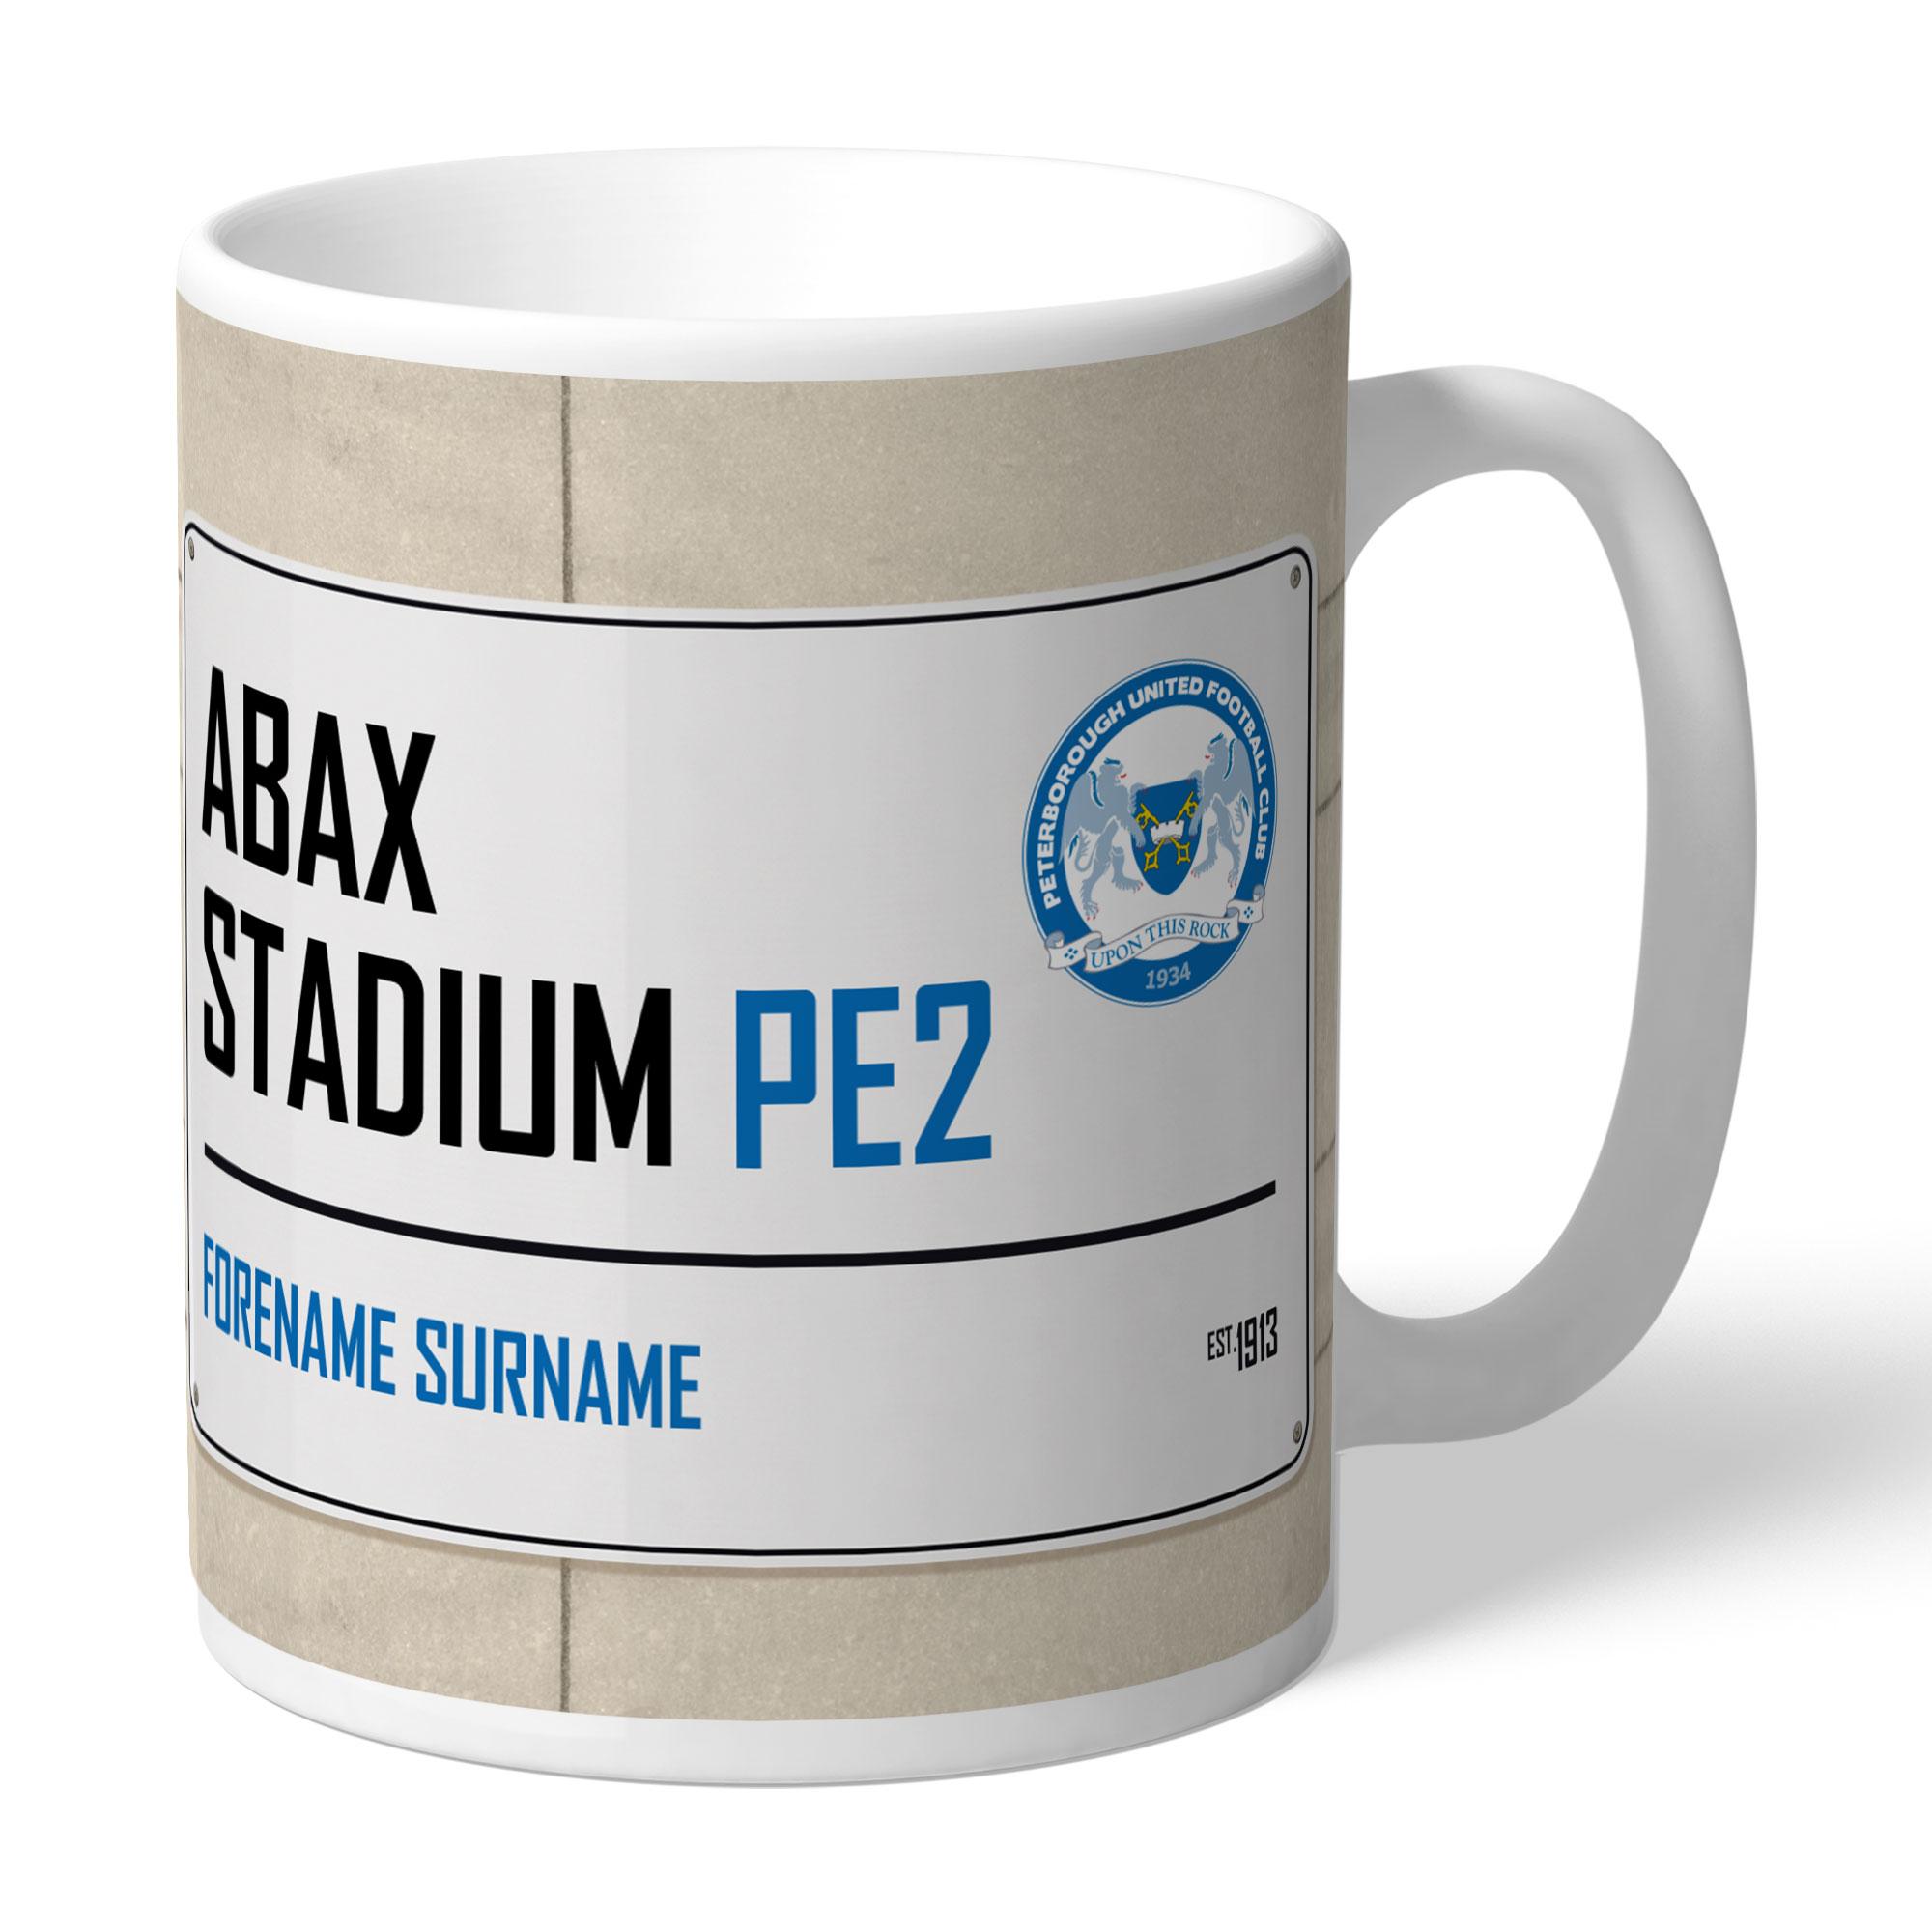 Peterborough United FC Street Sign Mug